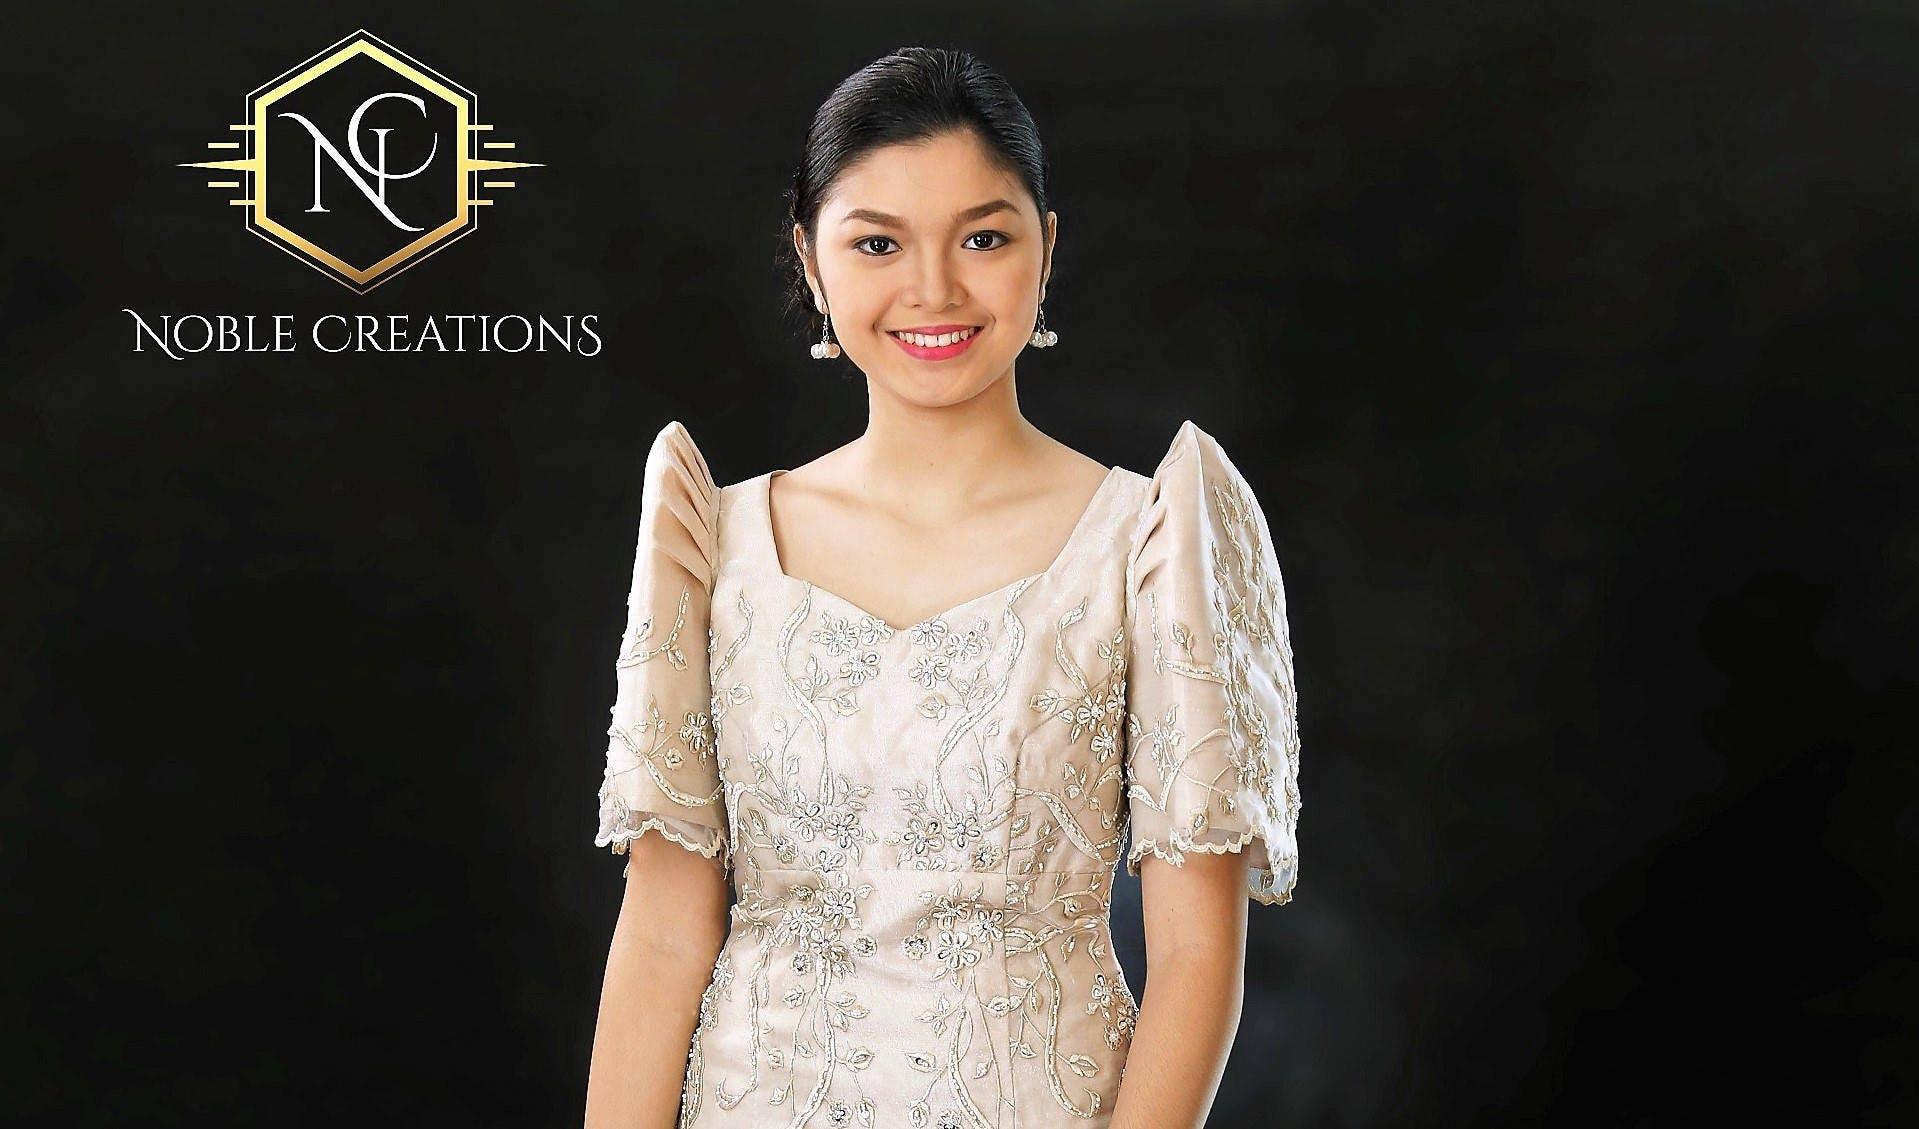 filipiniana dress embroidered and beaded mestiza maria clara baro at